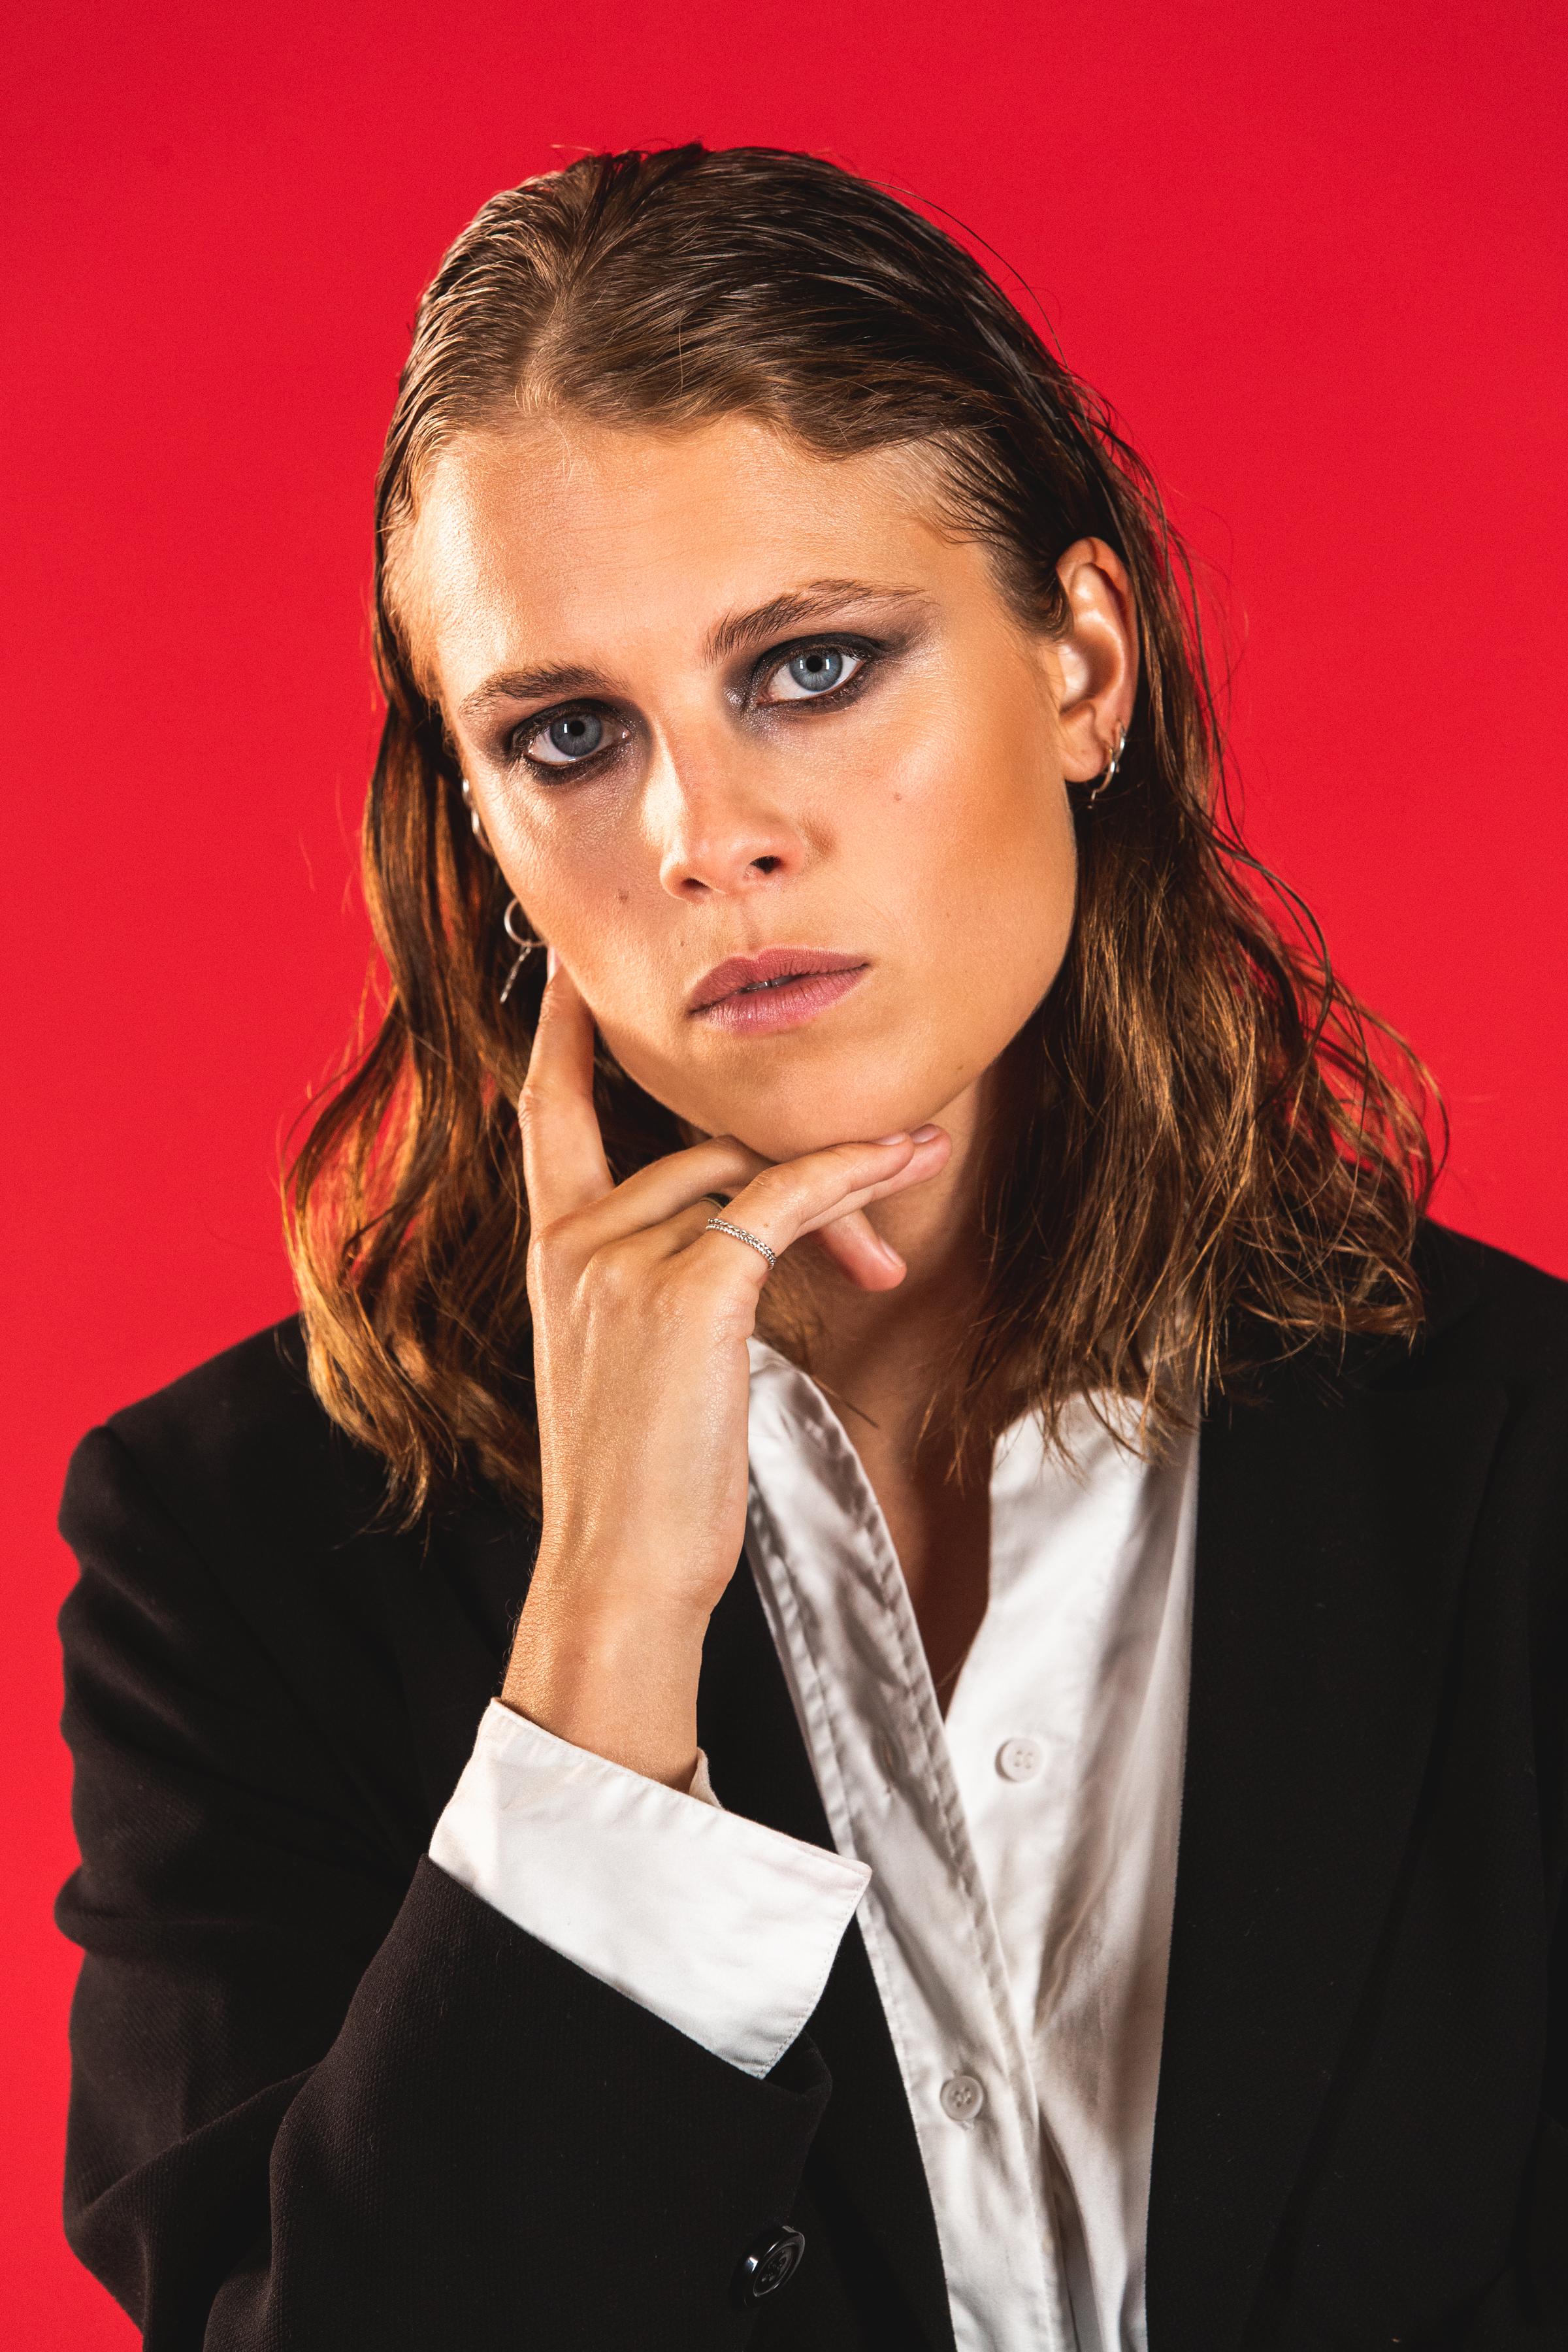 Marika Hackman 2019 NME